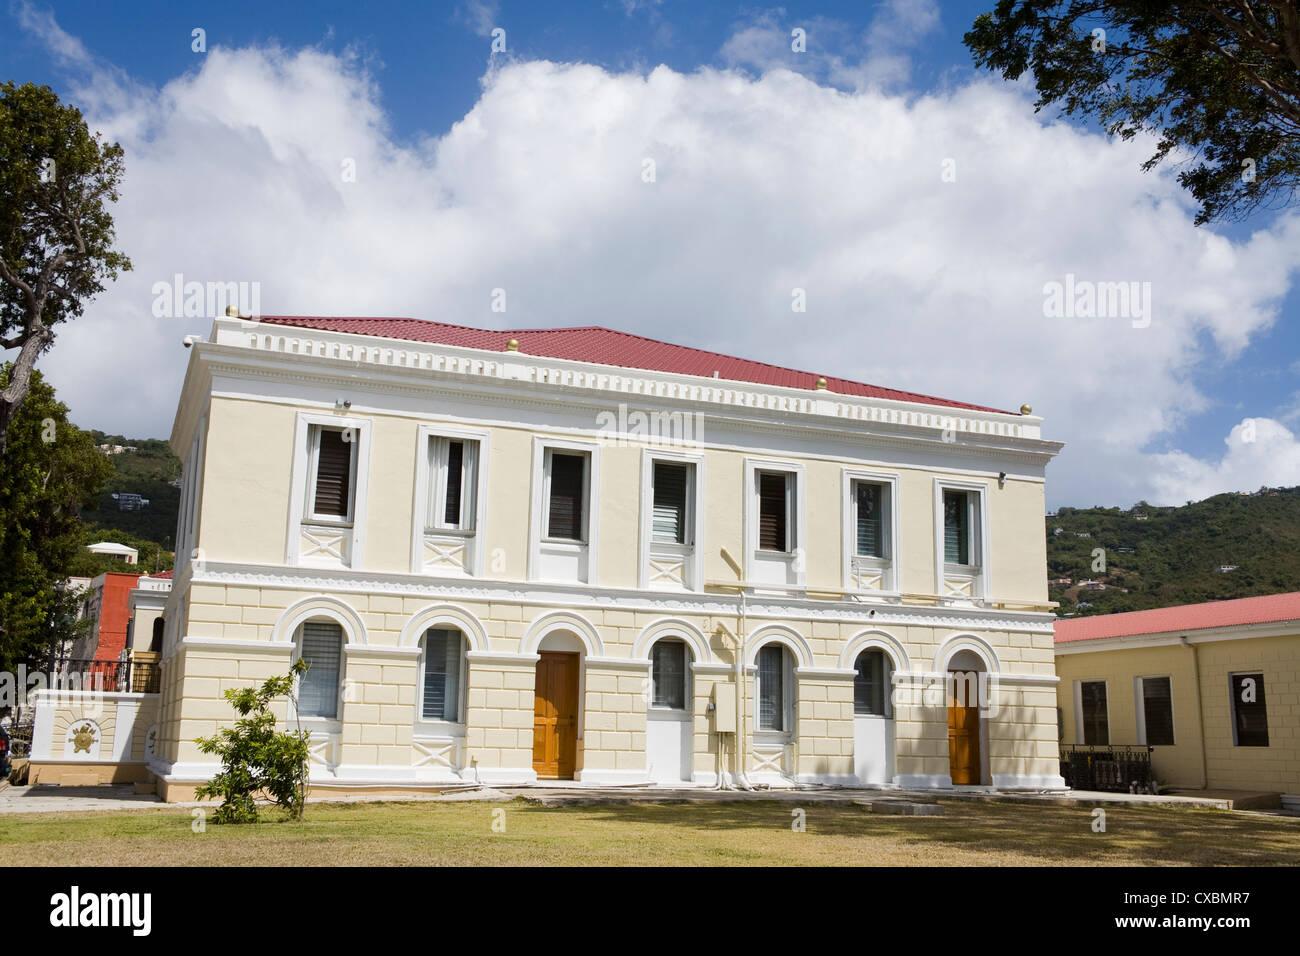 Legislature Building in Charlotte Amalie, St. Thomas Island, U.S. Virgin Islands, West Indies, Caribbean, Central - Stock Image